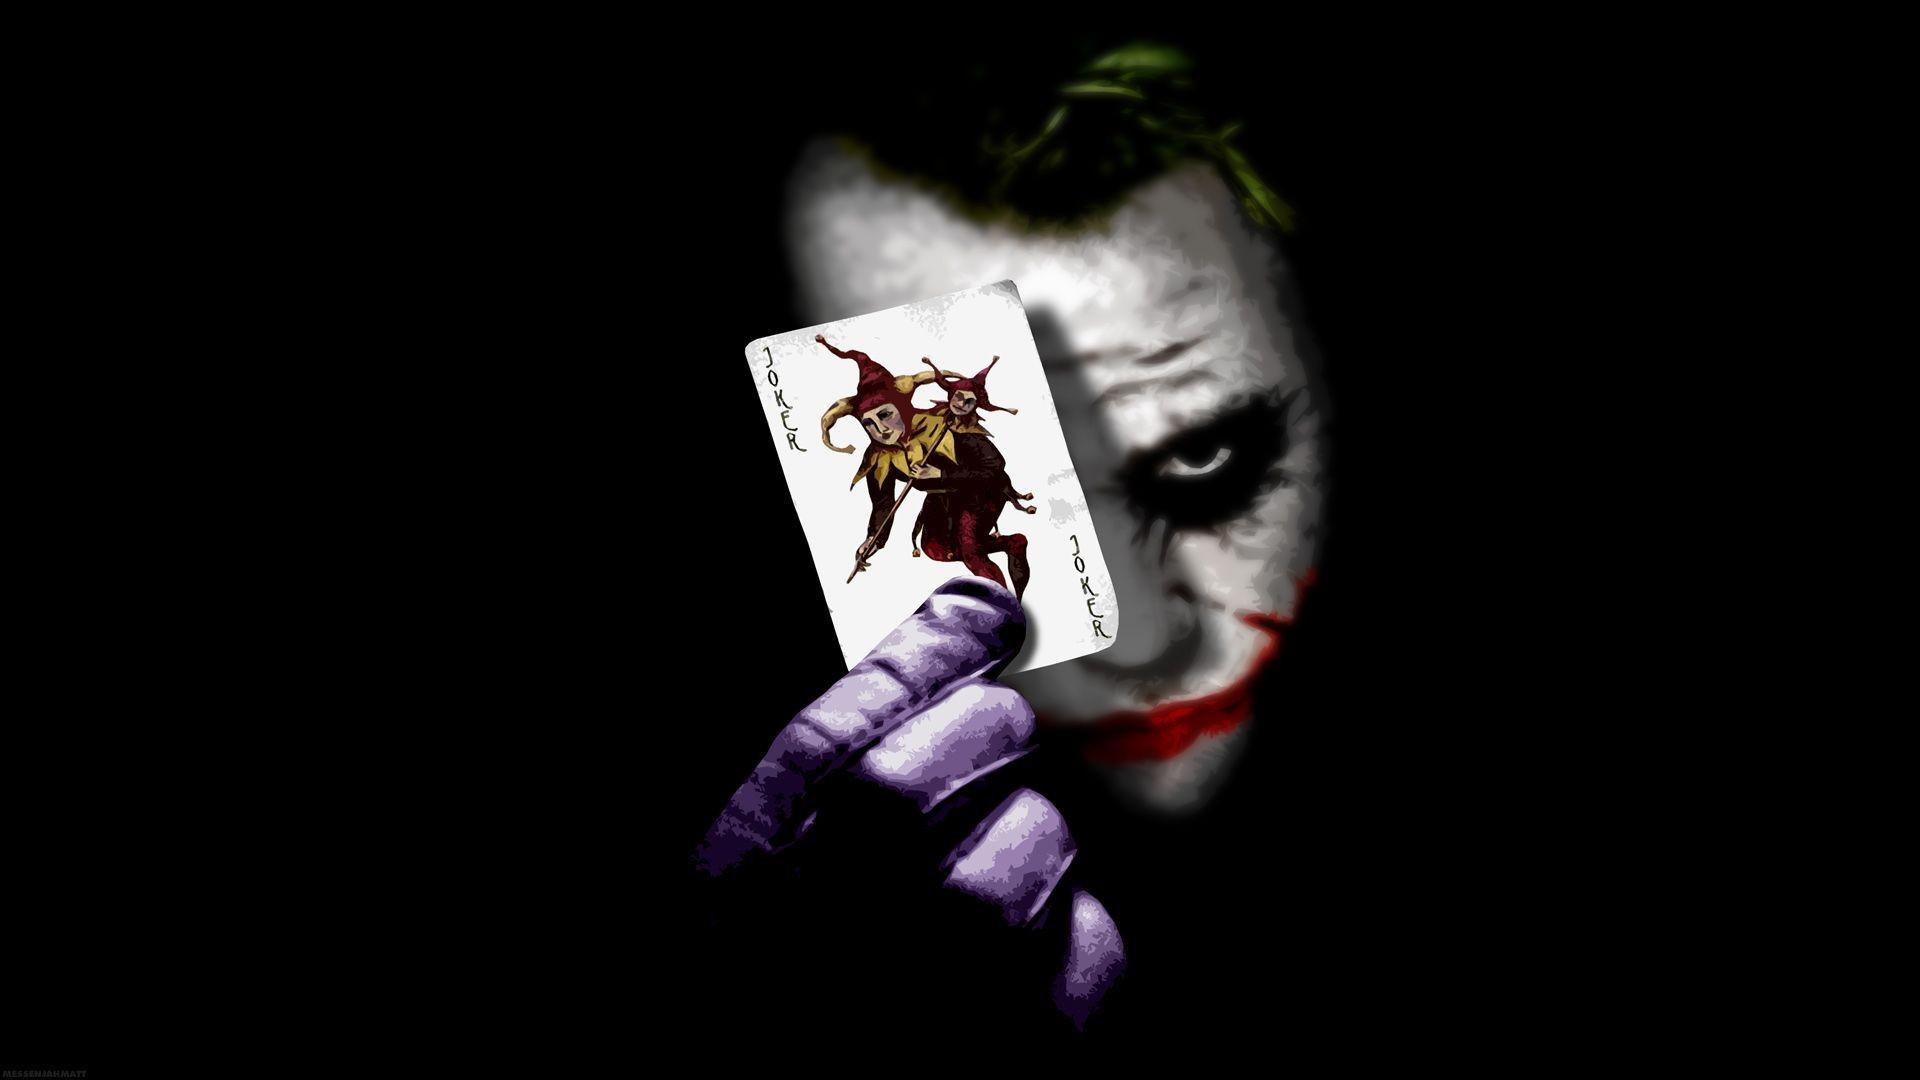 … cool joker wallpaper hd 72 avengerswallpapers …